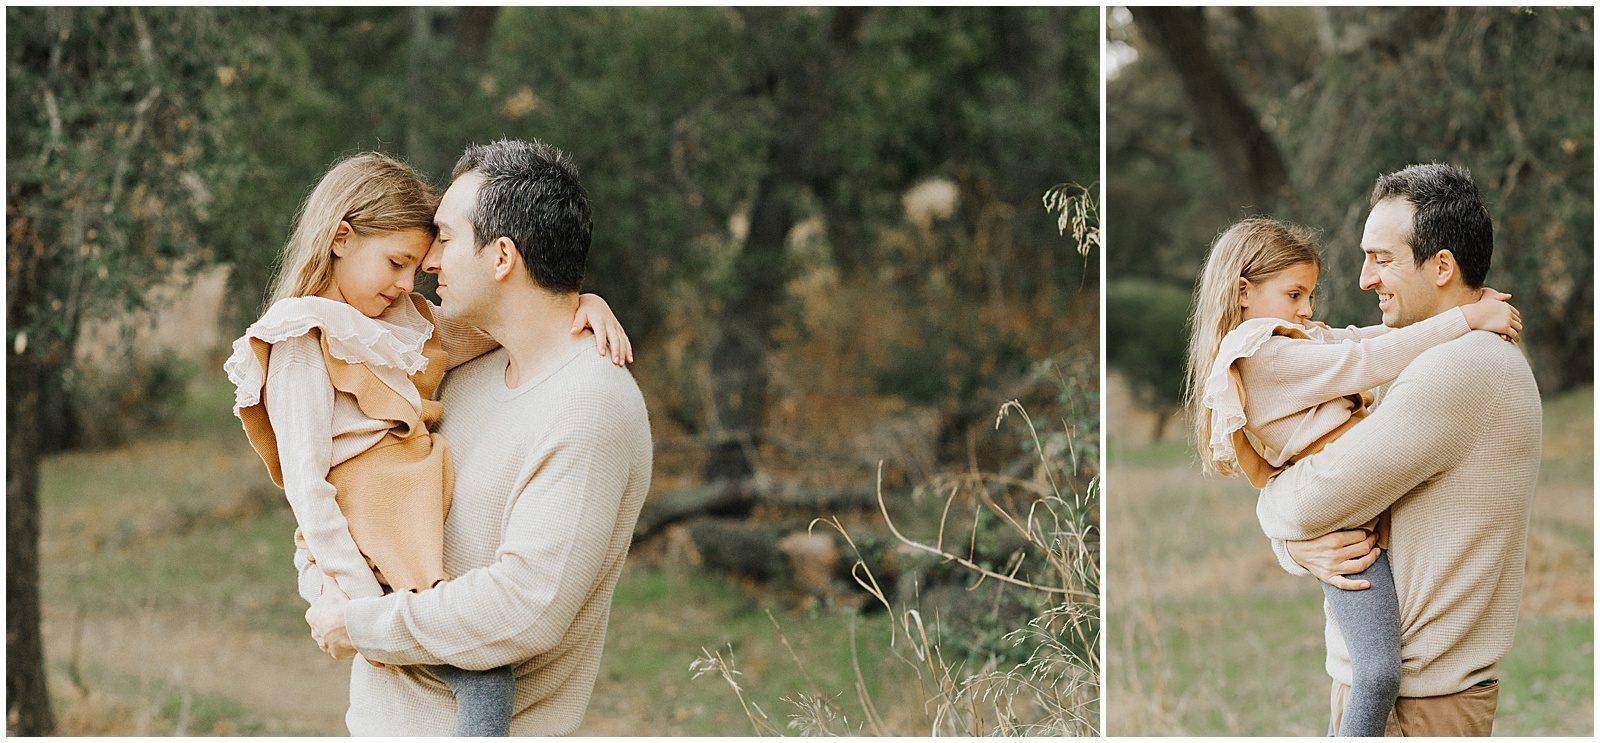 Orange County Extended Family Photographer 0424